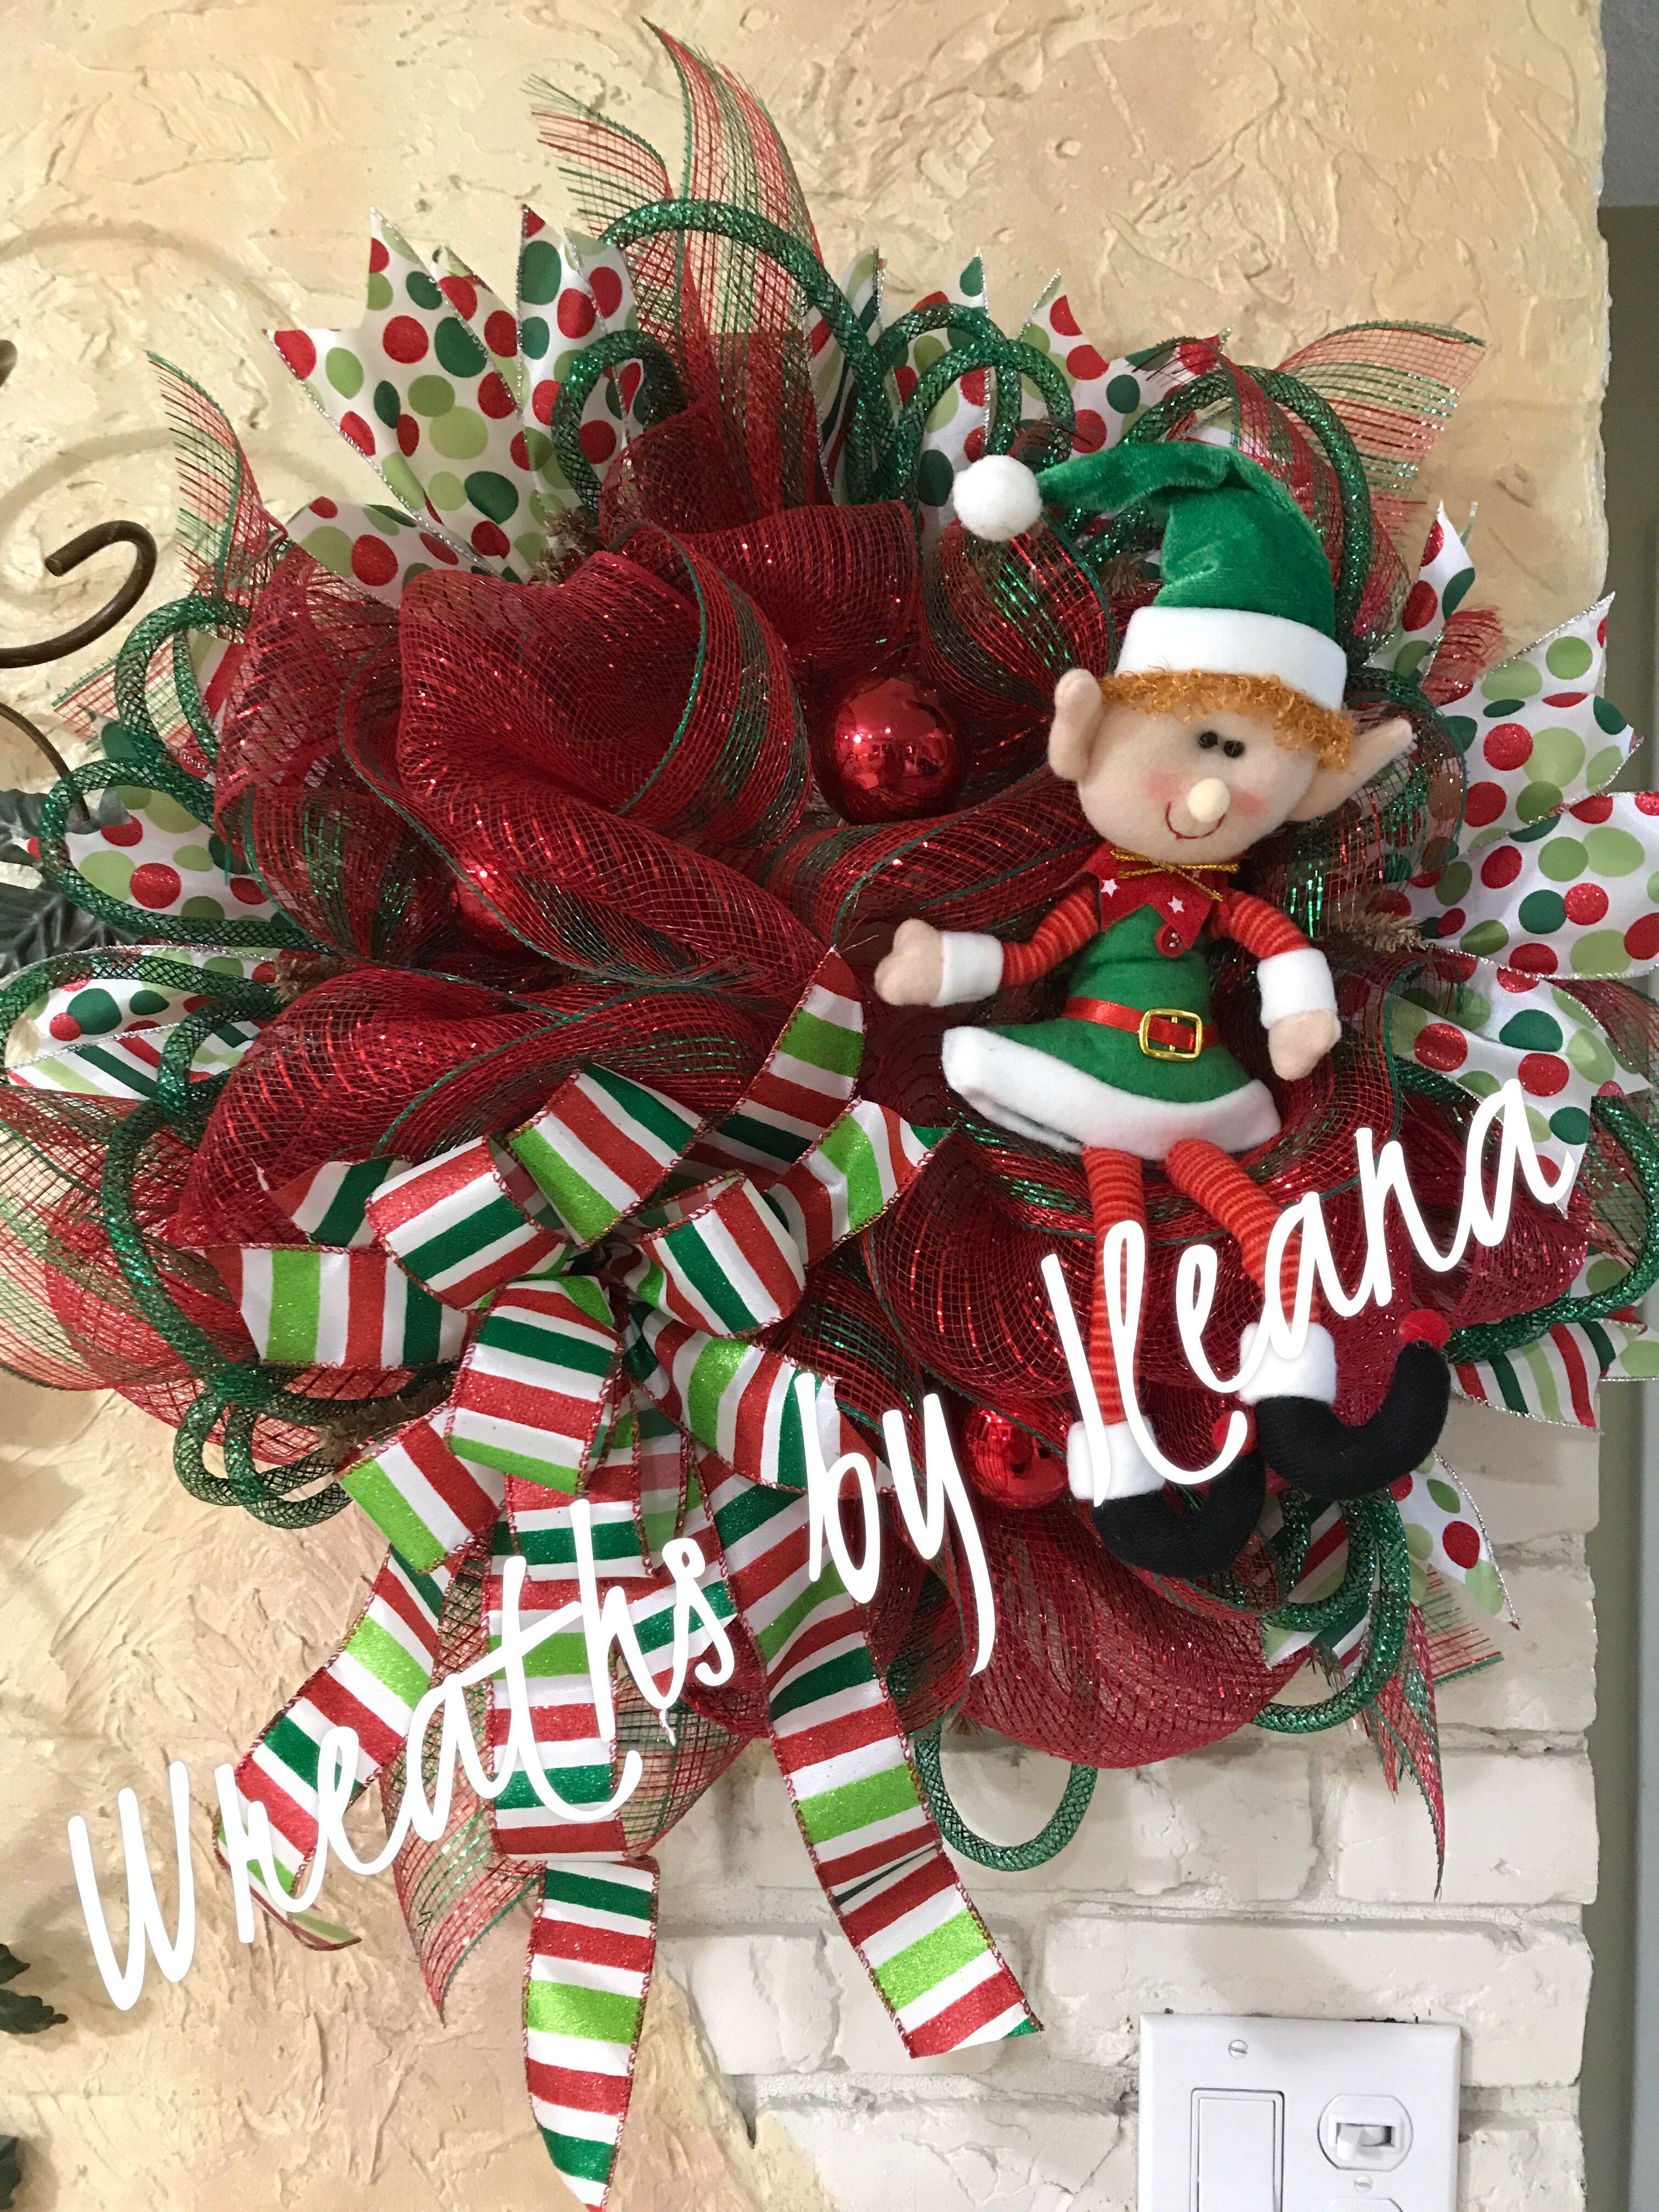 Pin by Wreaths By Ileana on Wreaths by Ileana Pinterest